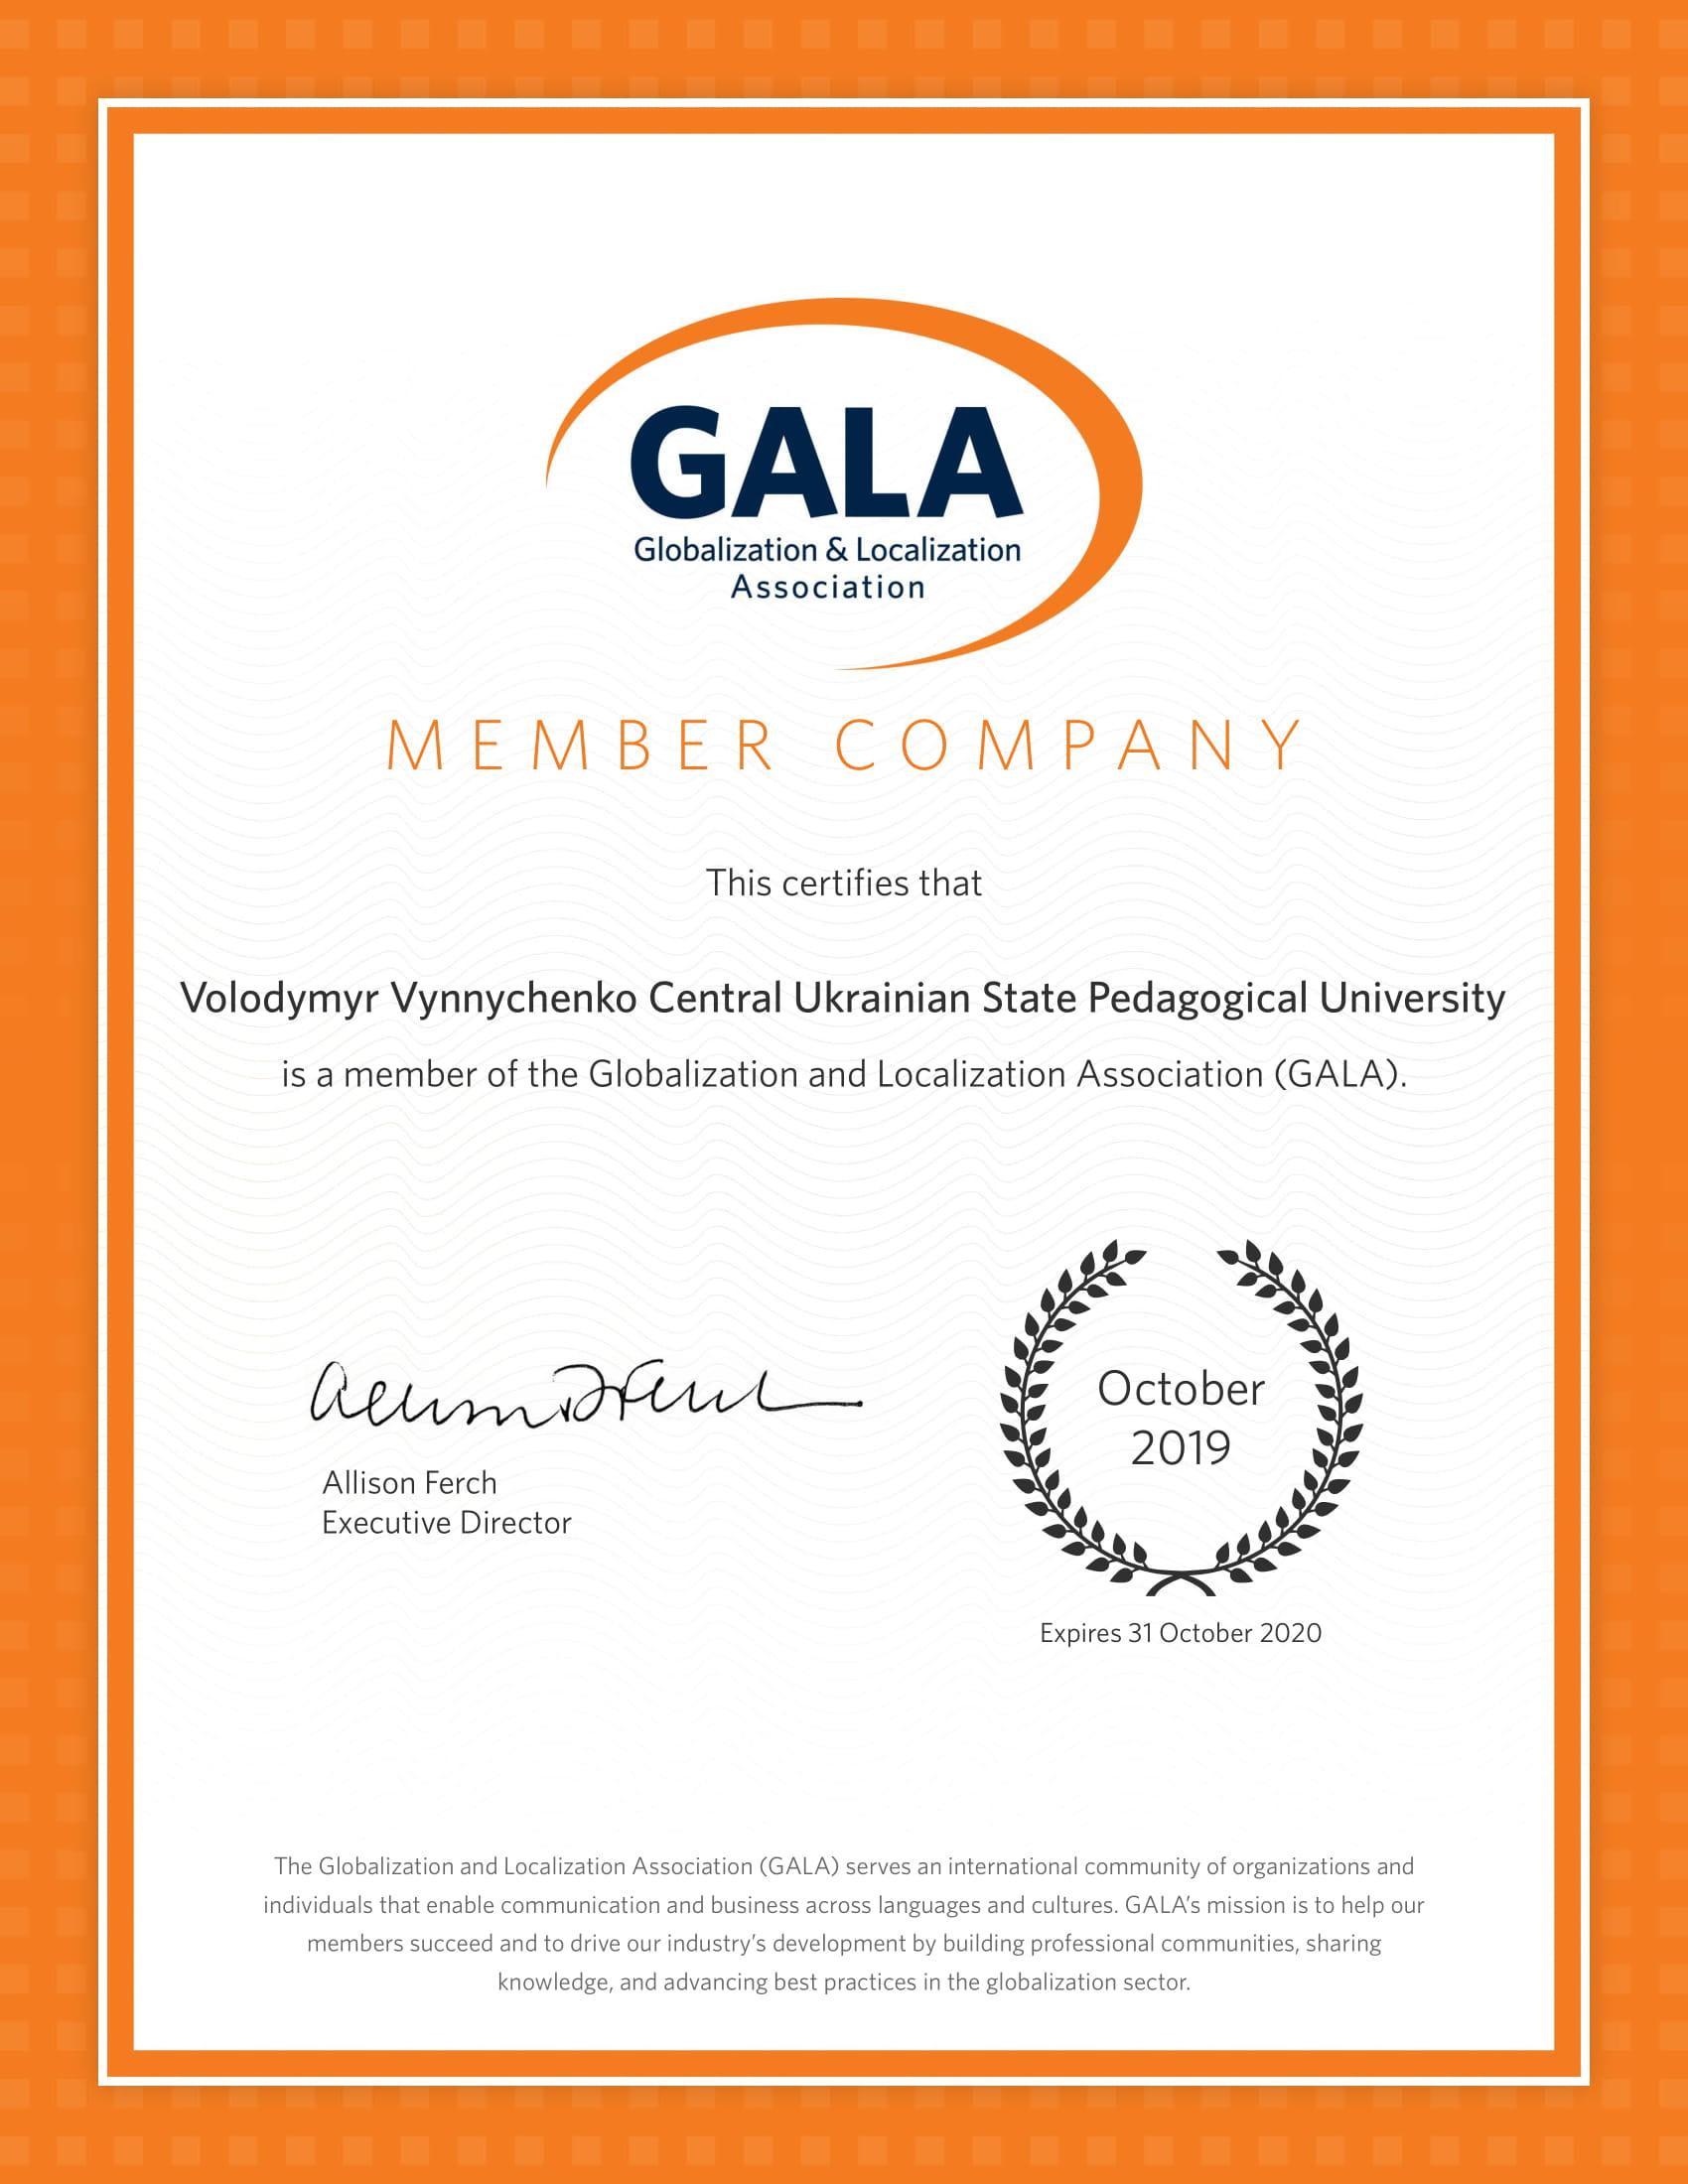 GALA Member Certificate 2019_Volodymyr Vynnychenko Central Ukrainian State Pedagogical University-1